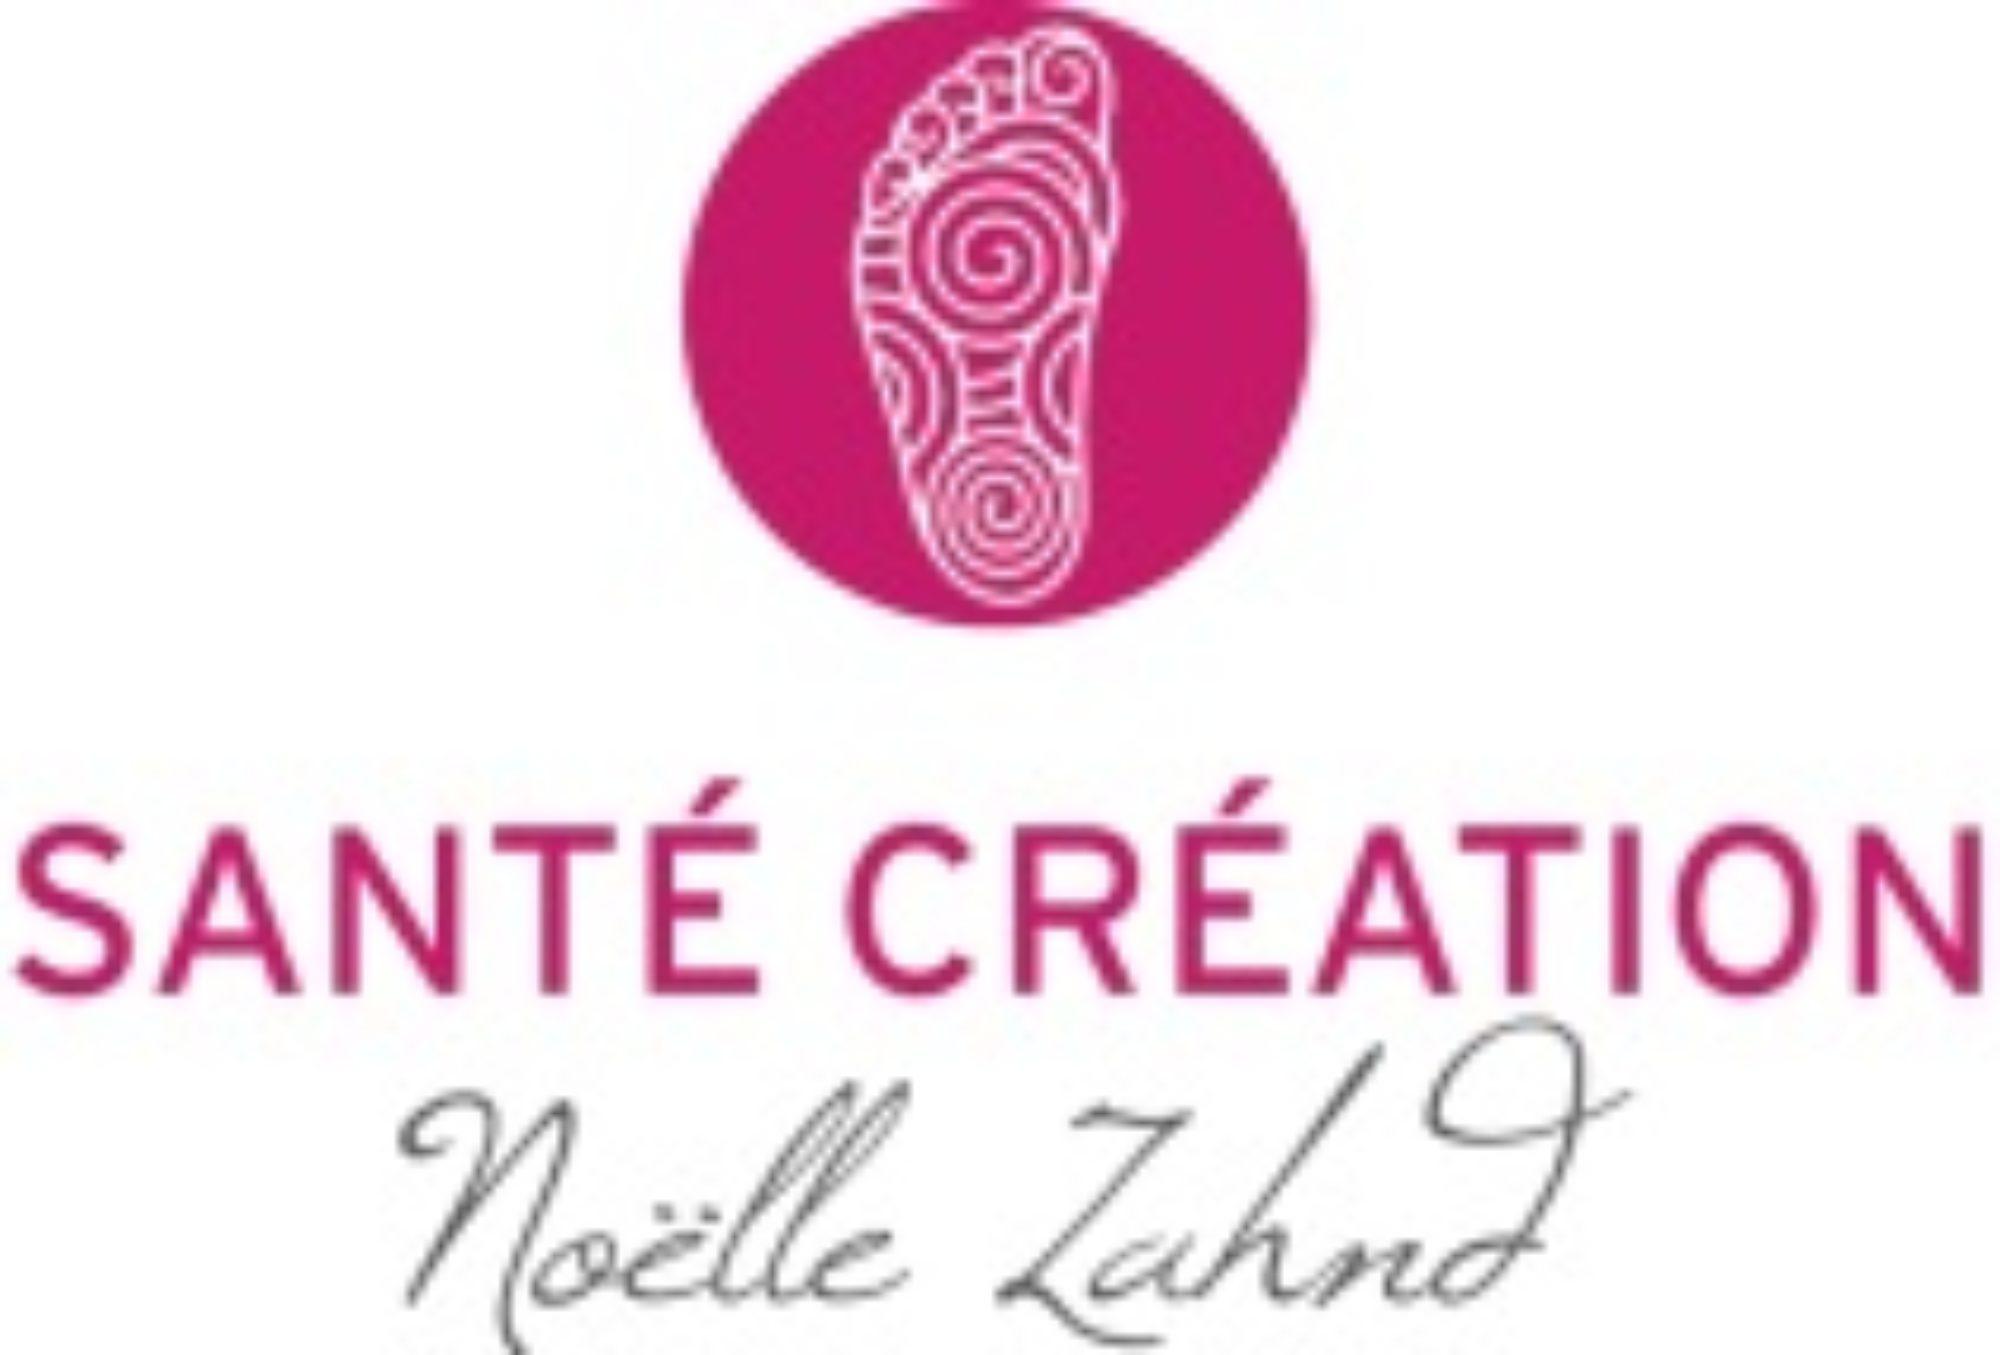 Sante-Creation